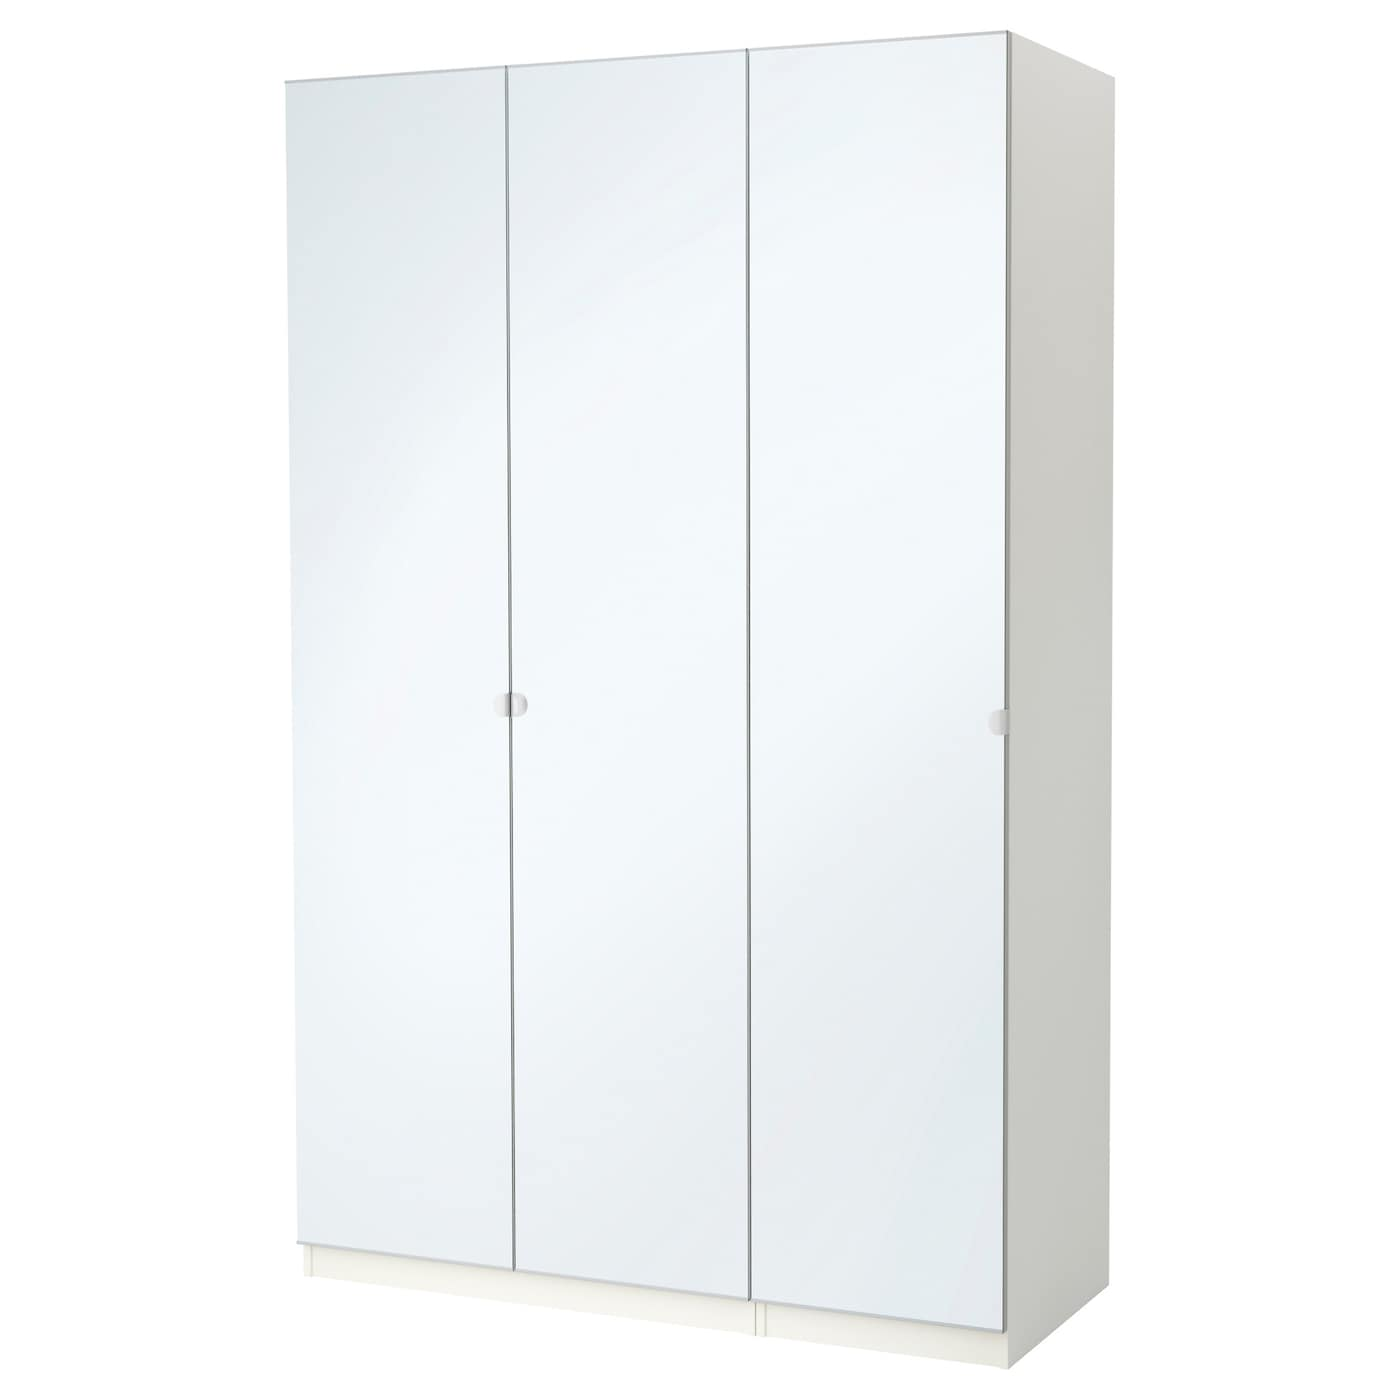 Pax armoire penderie blanc vikedal miroir 150x60x236 cm ikea - Armoire penderie miroir ...